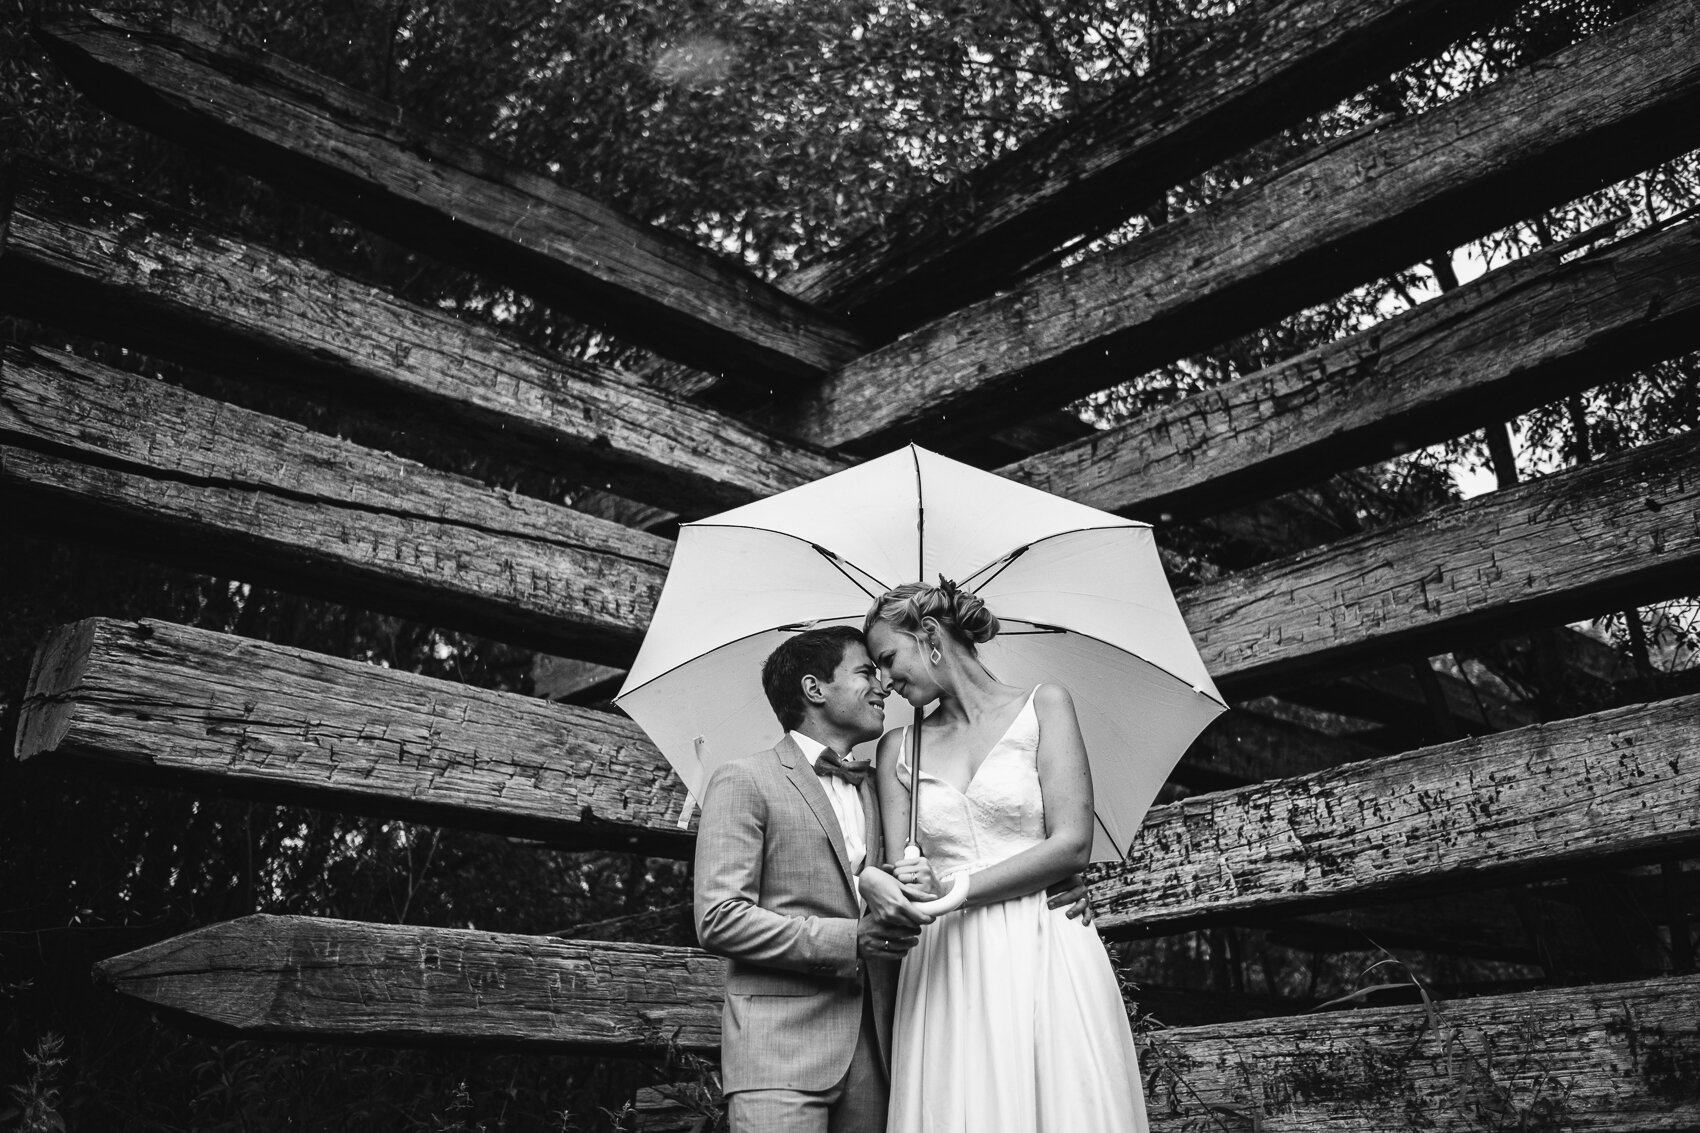 iso800 - huwelijksfotograaf isabo matthias verbeke foundation-14.jpg